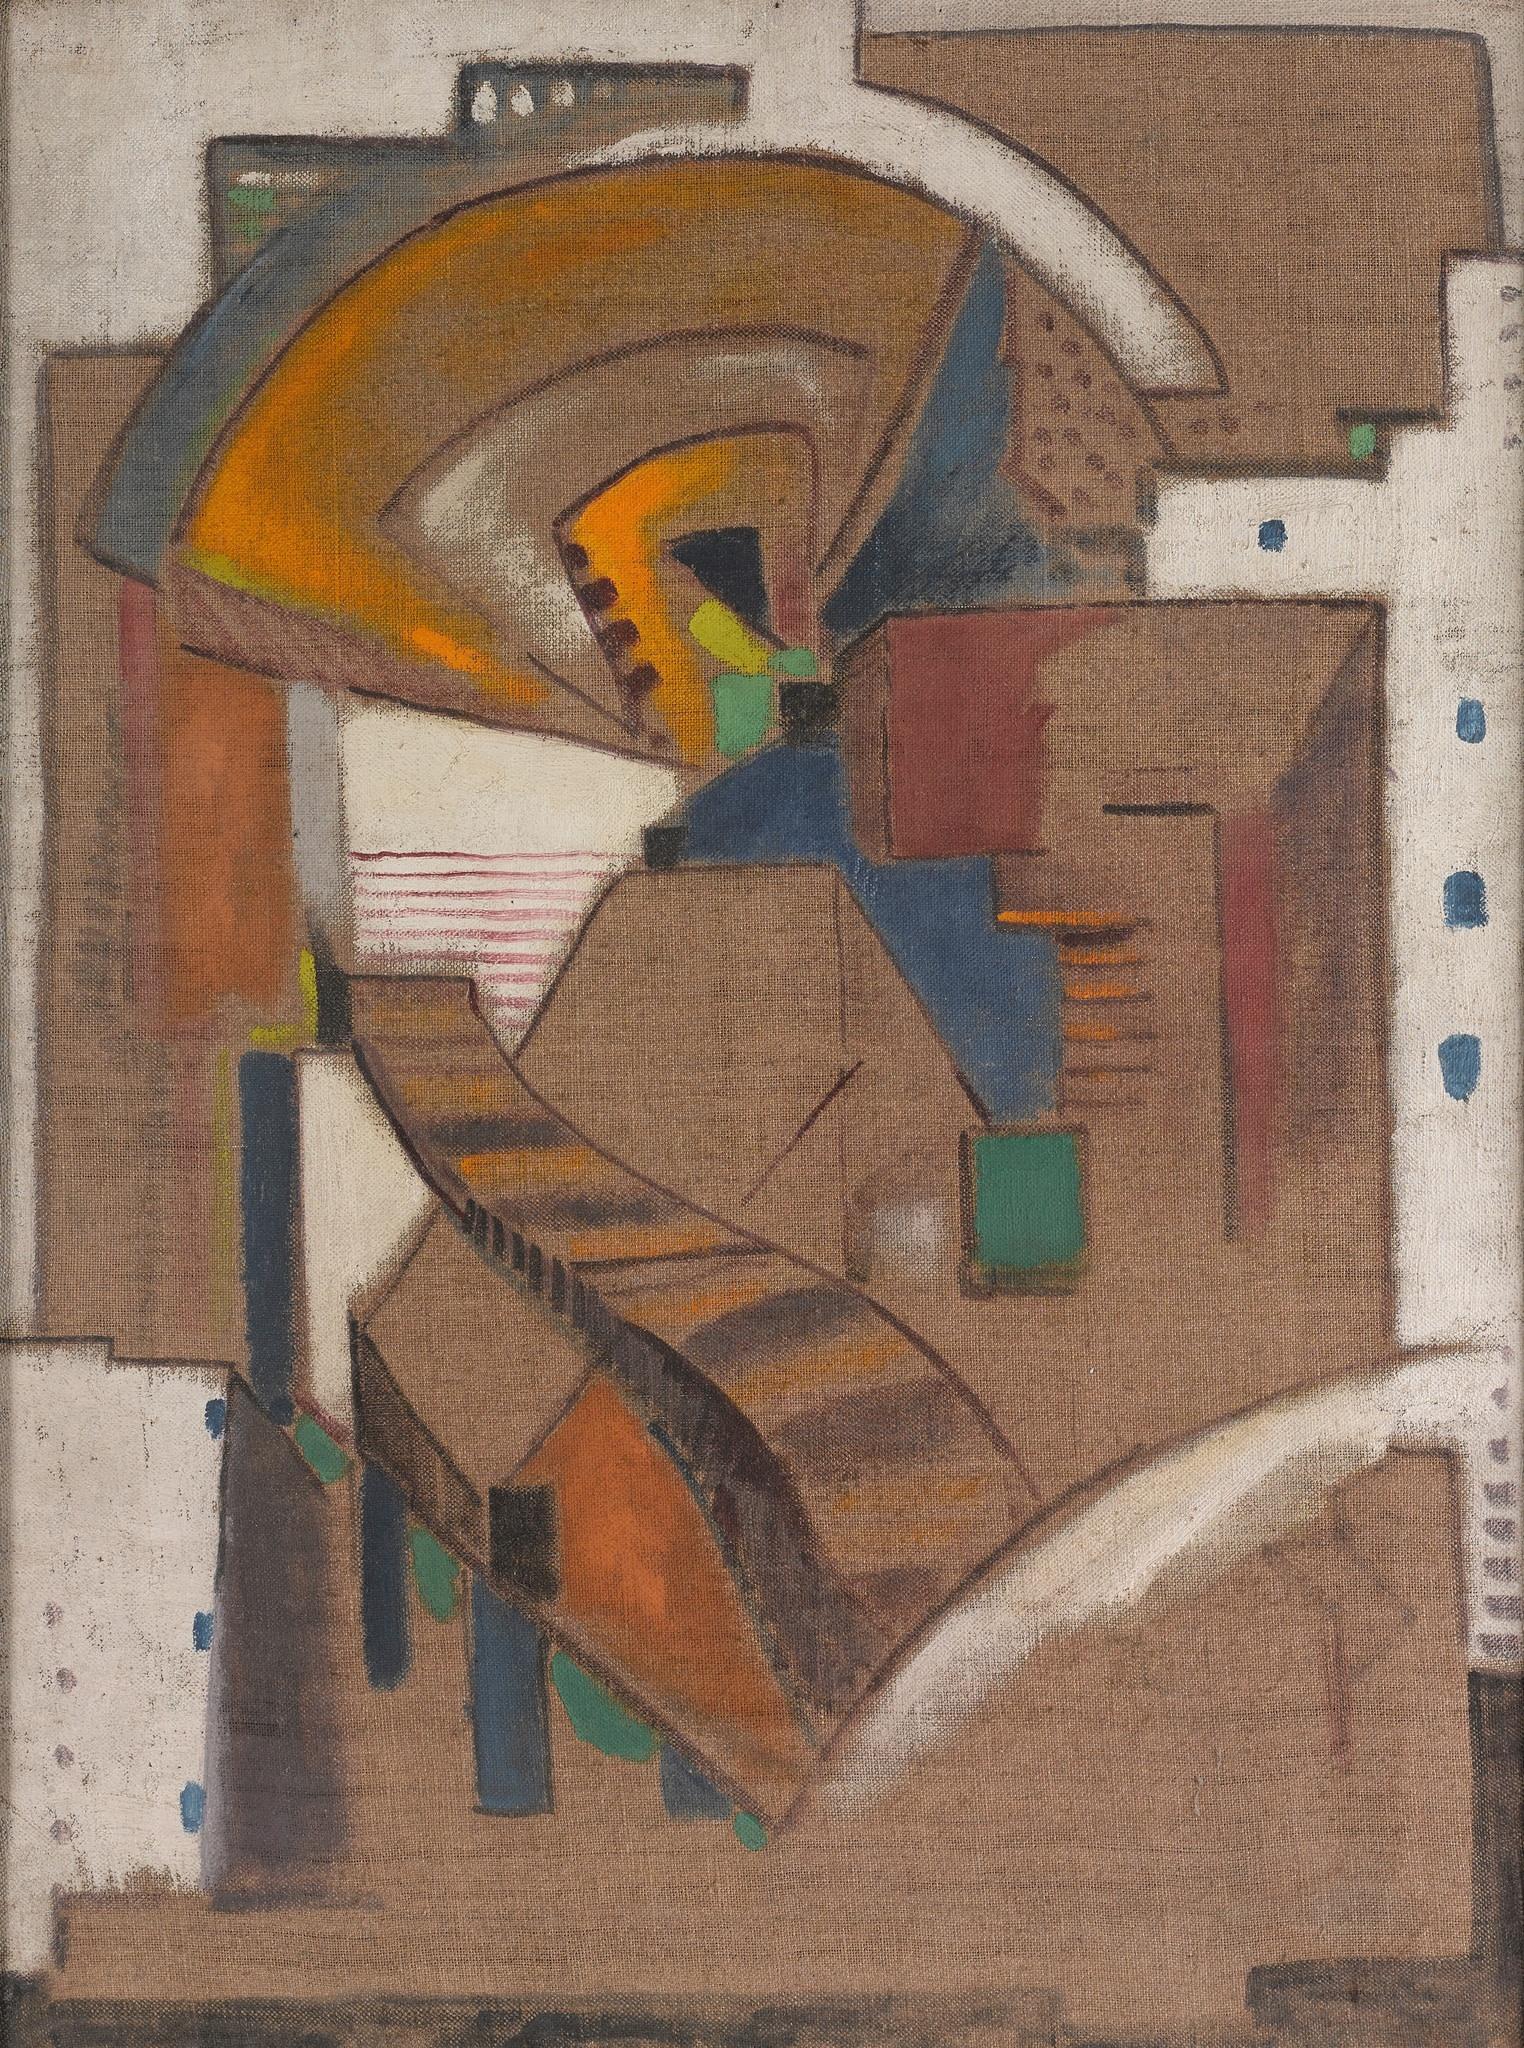 "<span class=""link fancybox-details-link""><a href=""/artists/27-harry-phelan-gibb/works/209/"">View Detail Page</a></span><div class=""artist""><strong>Harry Phelan Gibb</strong></div> 1870 - 1948 <div class=""title""><em>Abstract Composition</em>, c. 1912</div> <div class=""medium"">oil on canvas</div> <div class=""dimensions"">24 1/8 x 17 3/4 in<br />61 x 45 cm</div><div class=""copyright_line"">Copyright The Artist</div>"